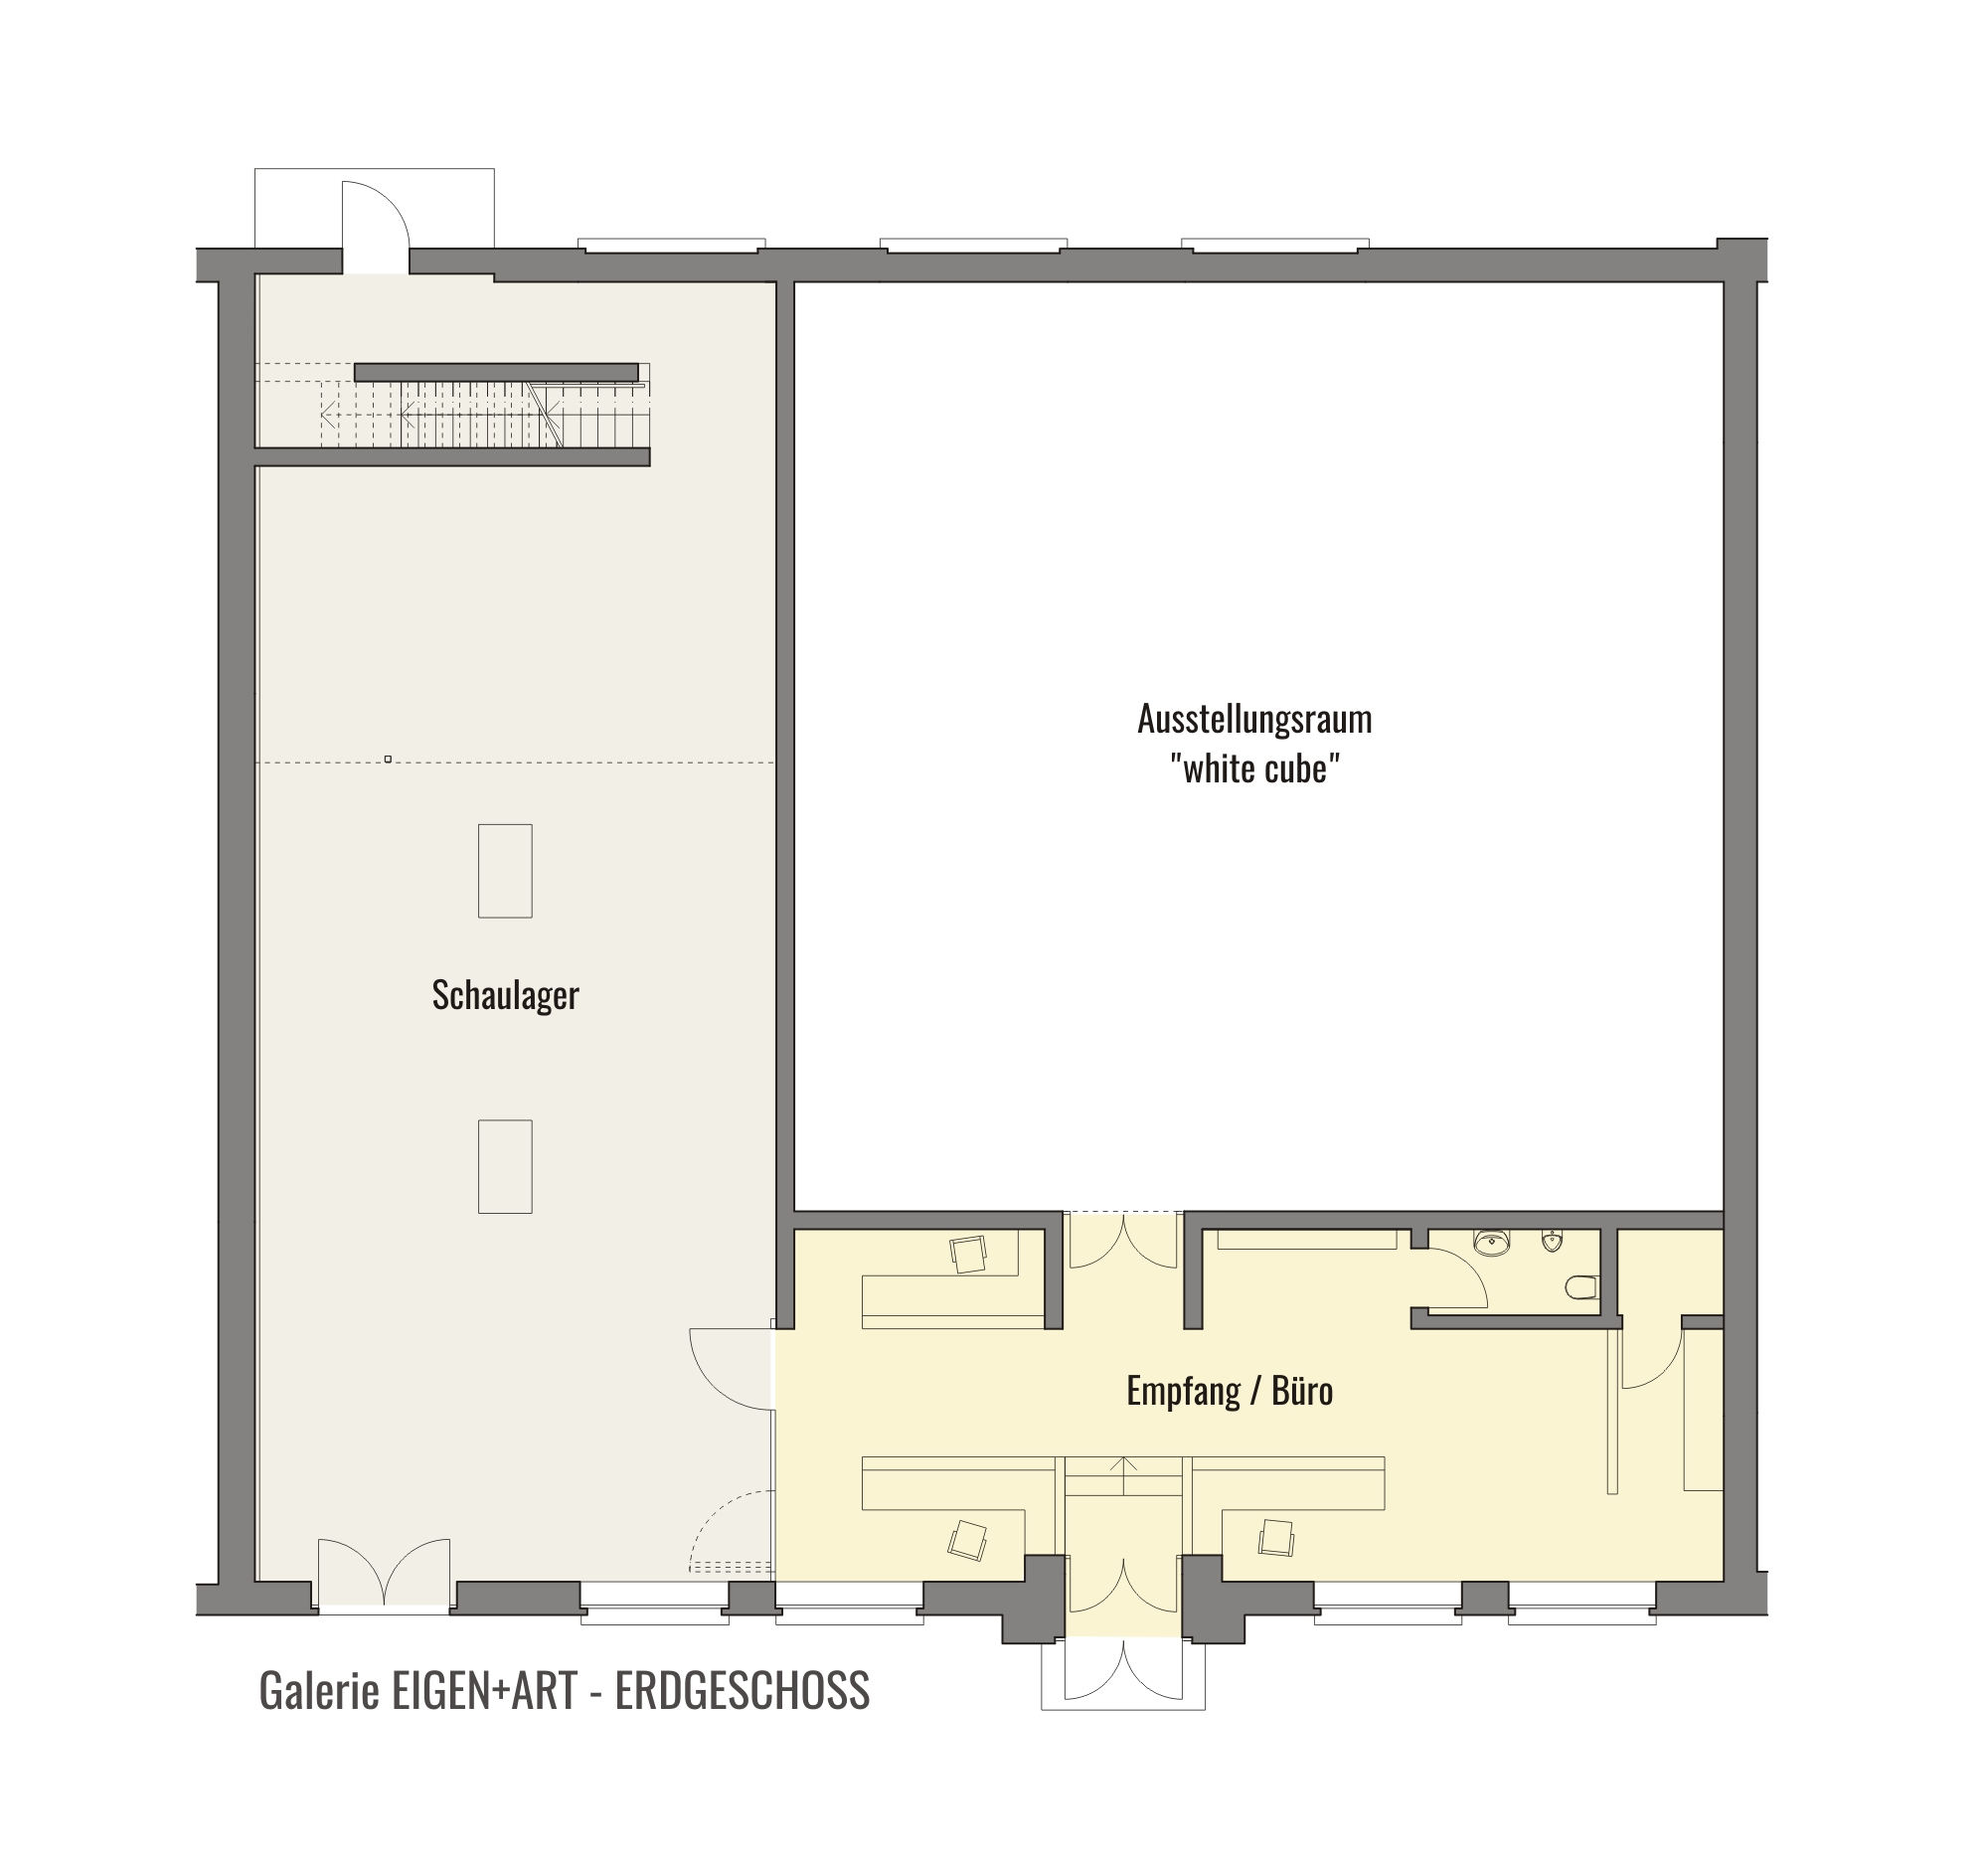 galerie eigen art leipzig 3m bauzentrale. Black Bedroom Furniture Sets. Home Design Ideas